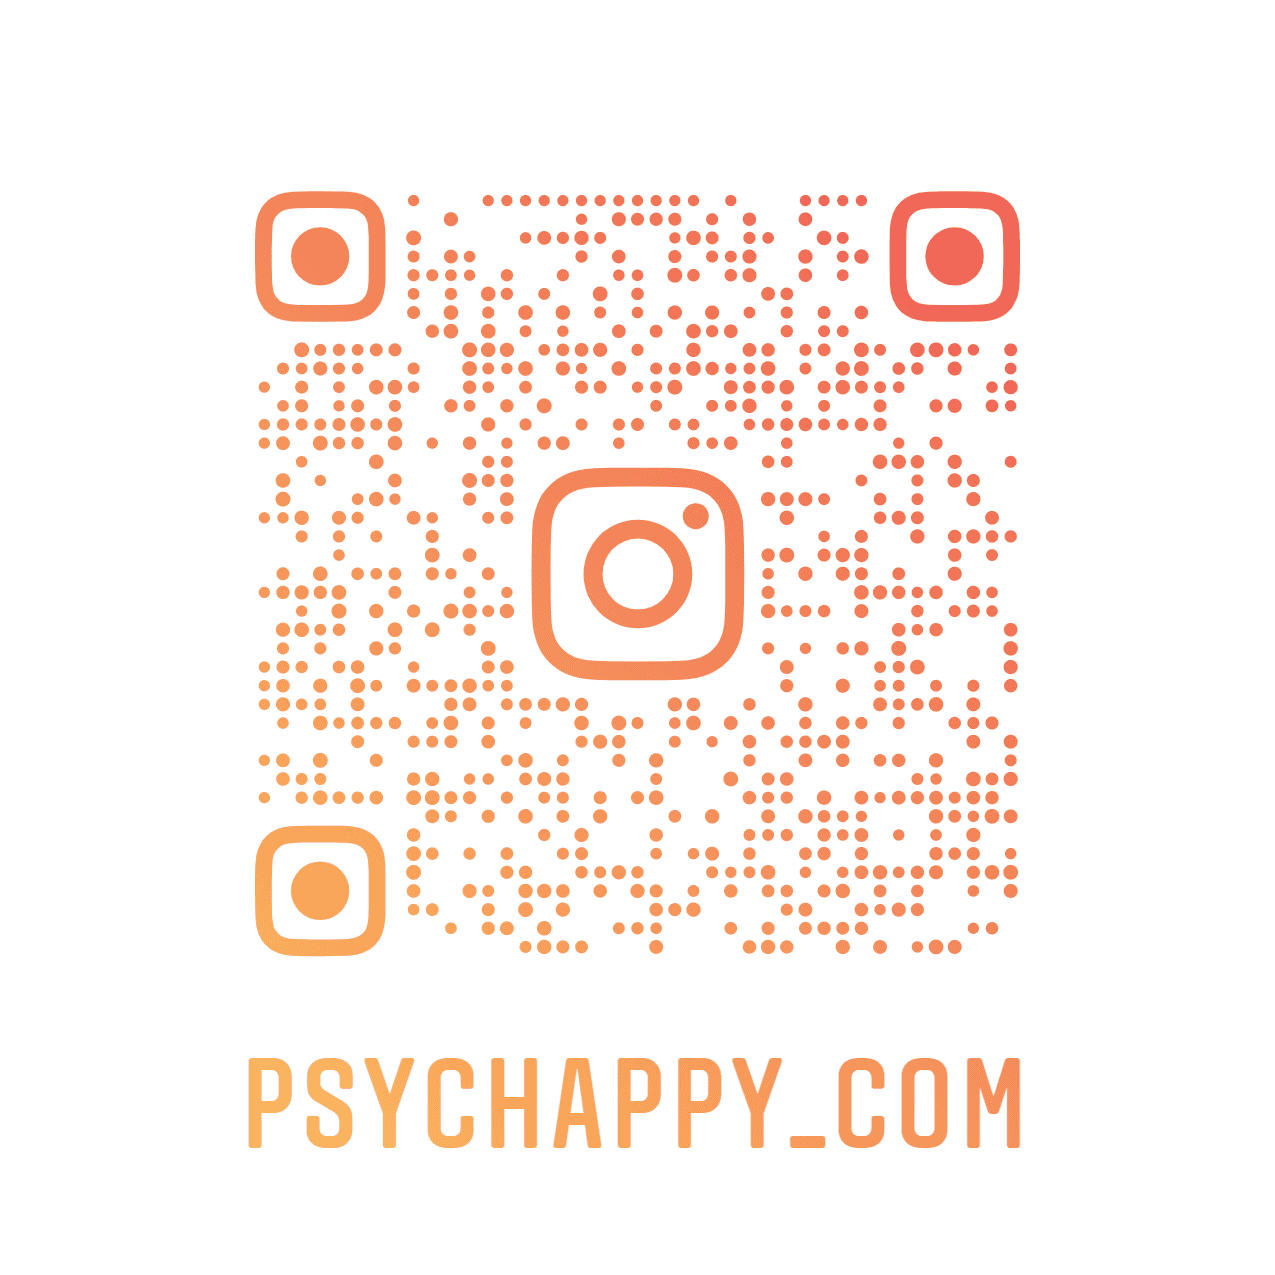 psychappy - stressfrei